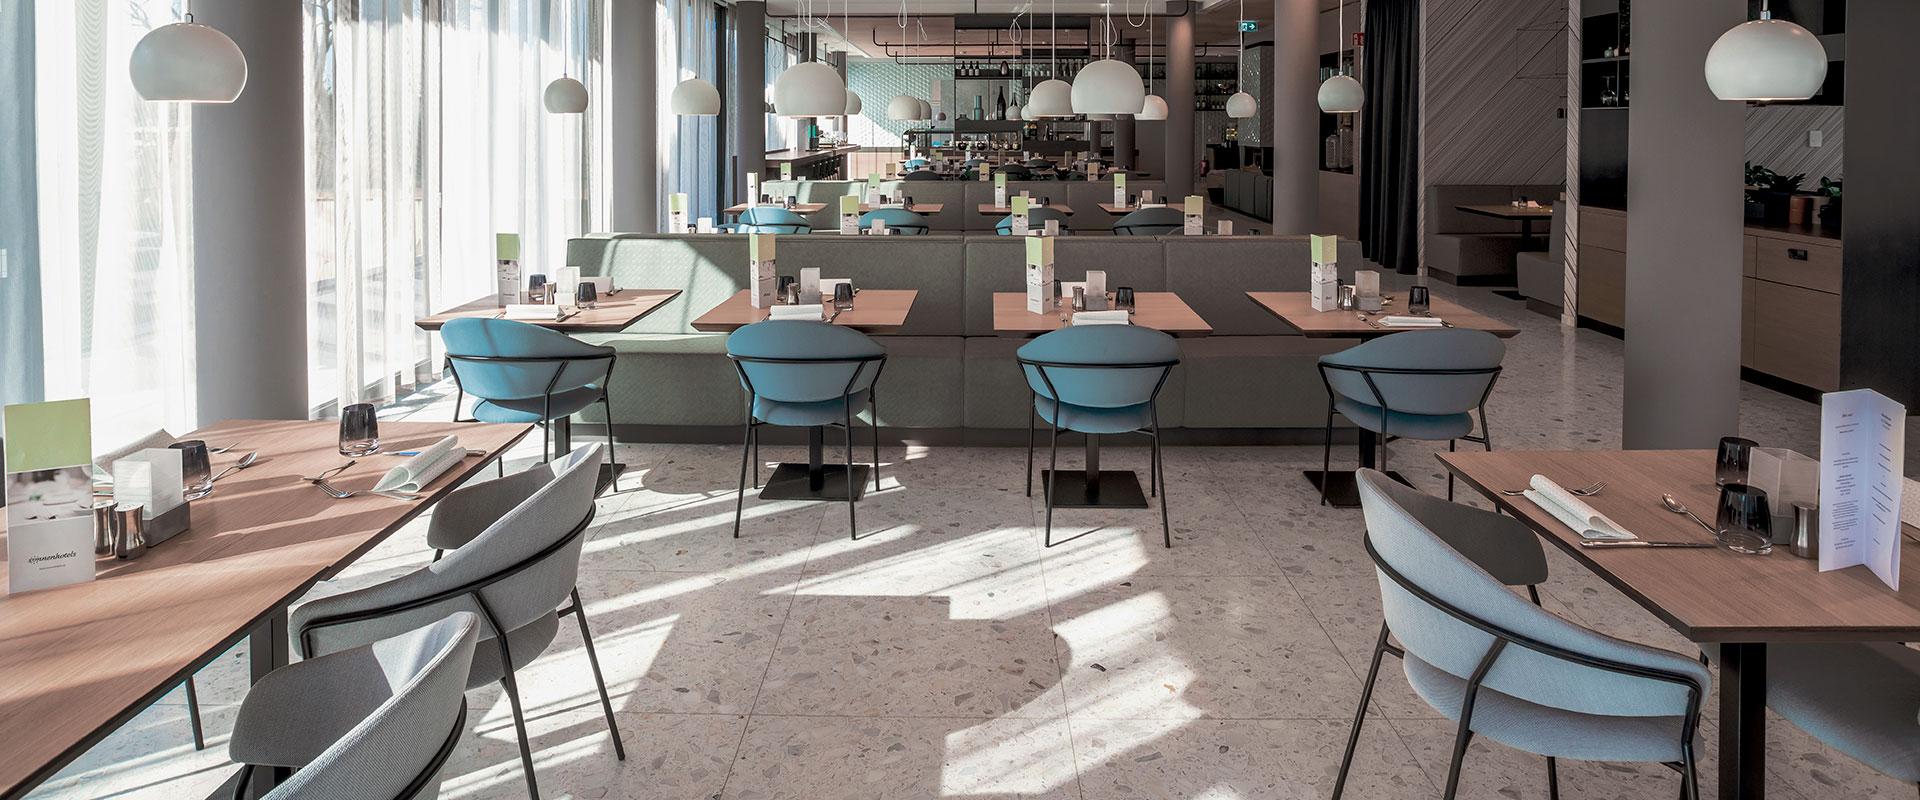 AGGLOTECH-progetto-Hotel-Salinengarten-slider-2